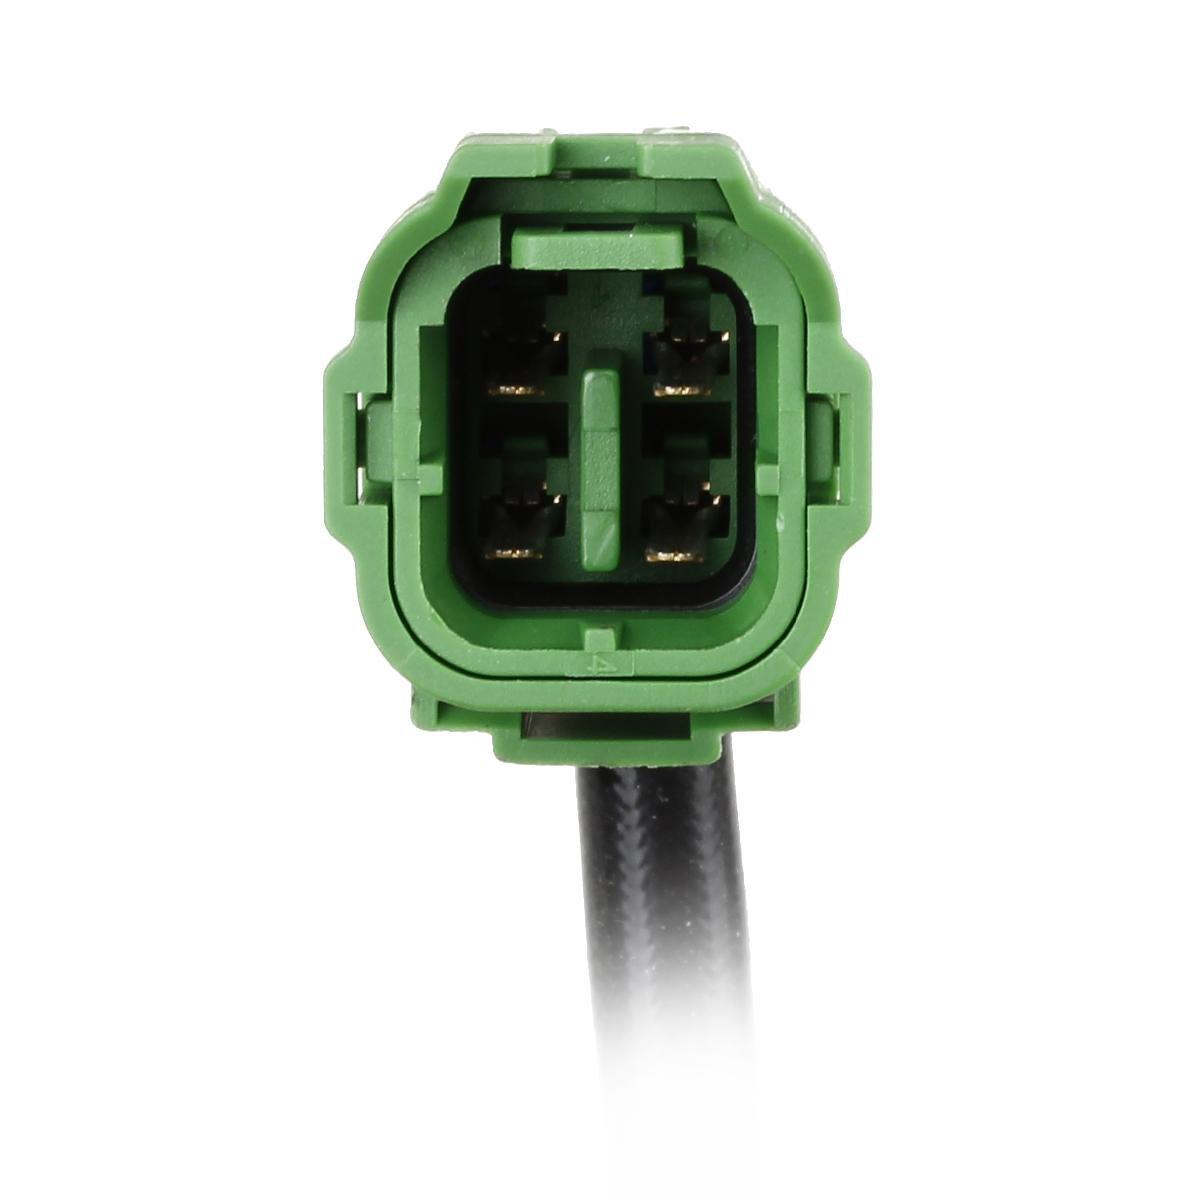 Kwiksen Heated 2Pcs Air Fuel Ratio O2 Oxygen Sensor 1 Sensor 2 Upstream Downstream 234-9033 Compatible with Suzuki SX4 L4-2.0L 2007 1821365J12